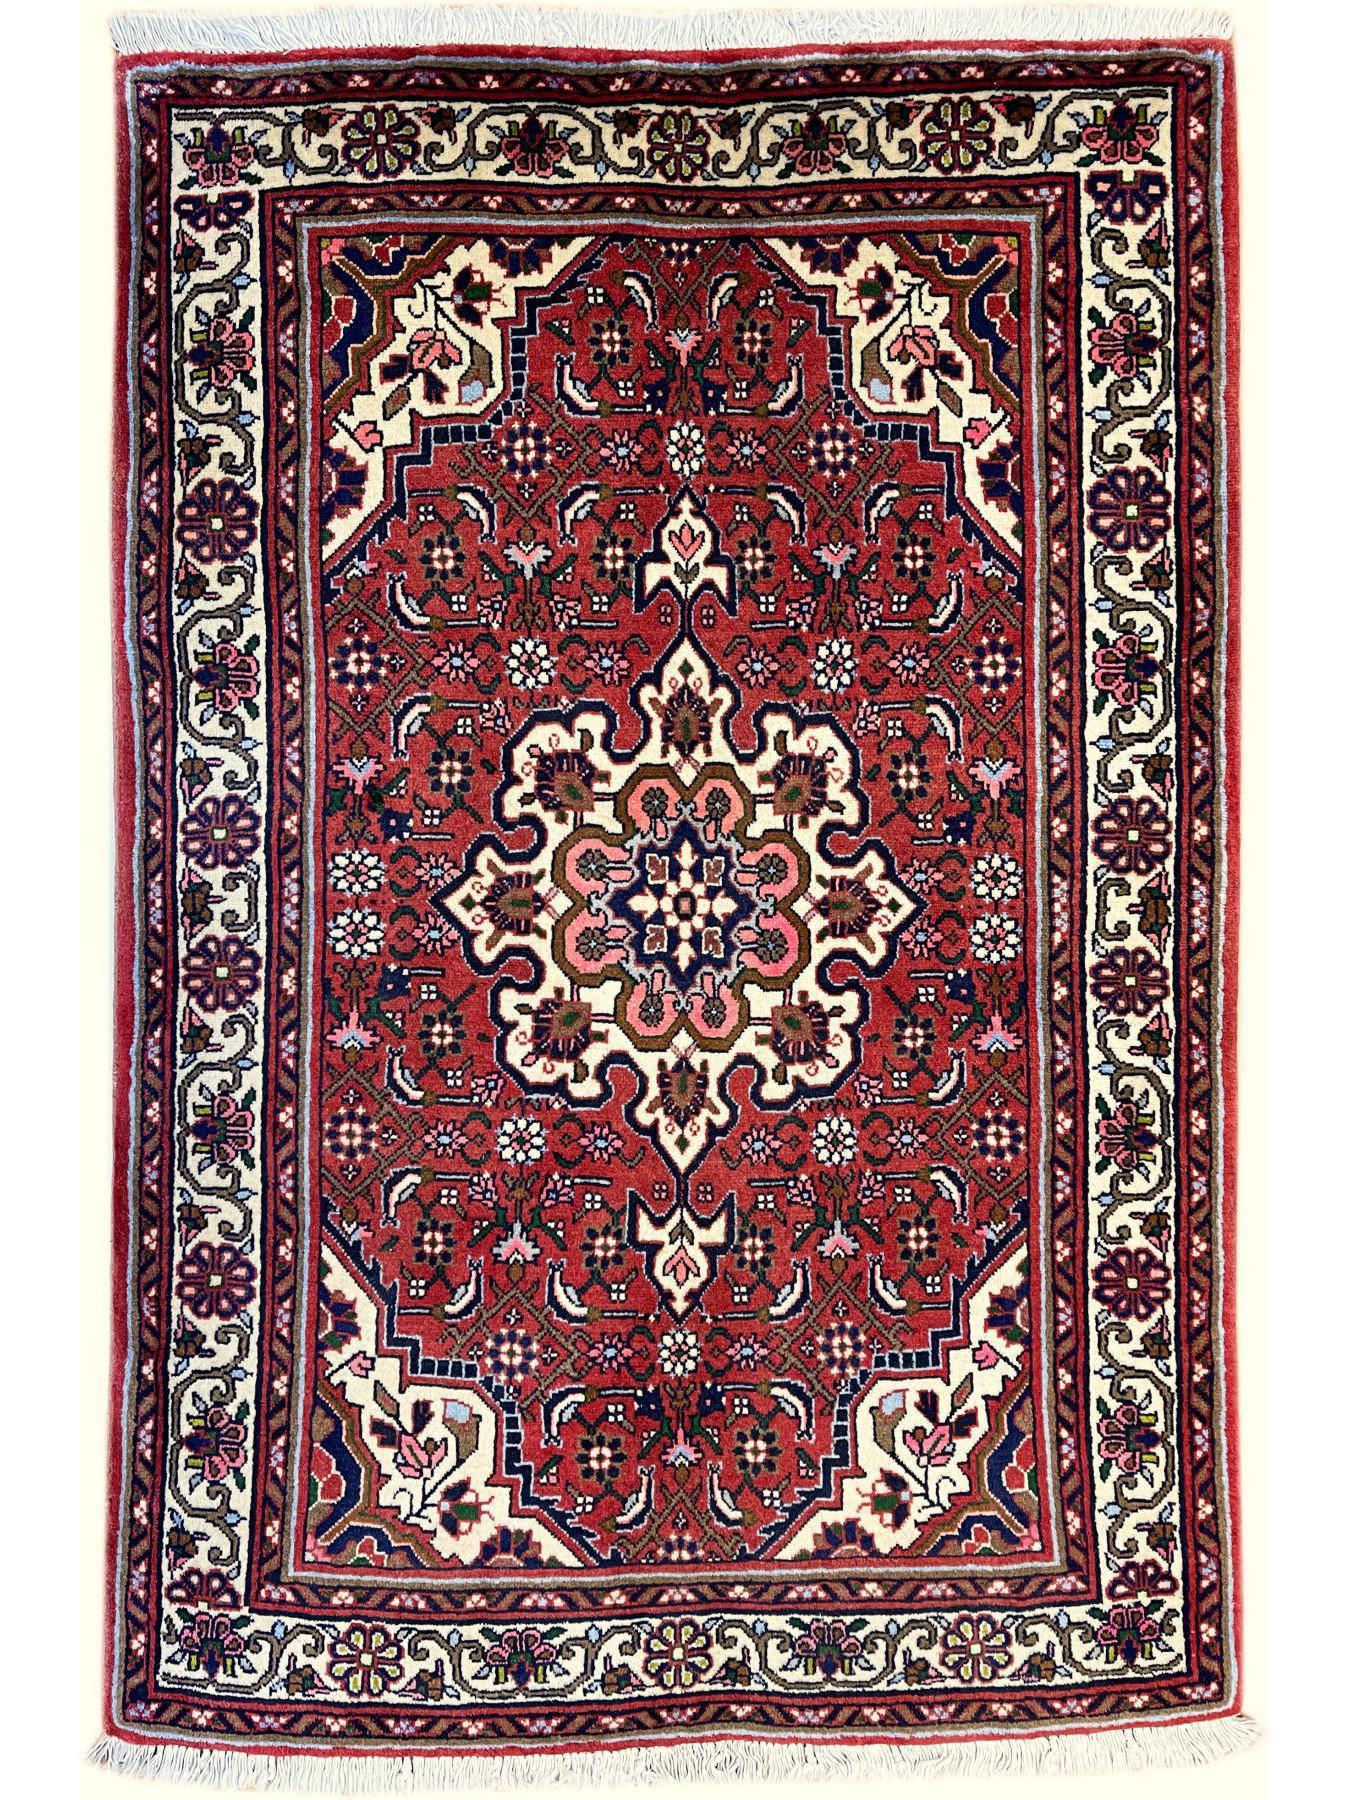 Tapis persans - Bidjar